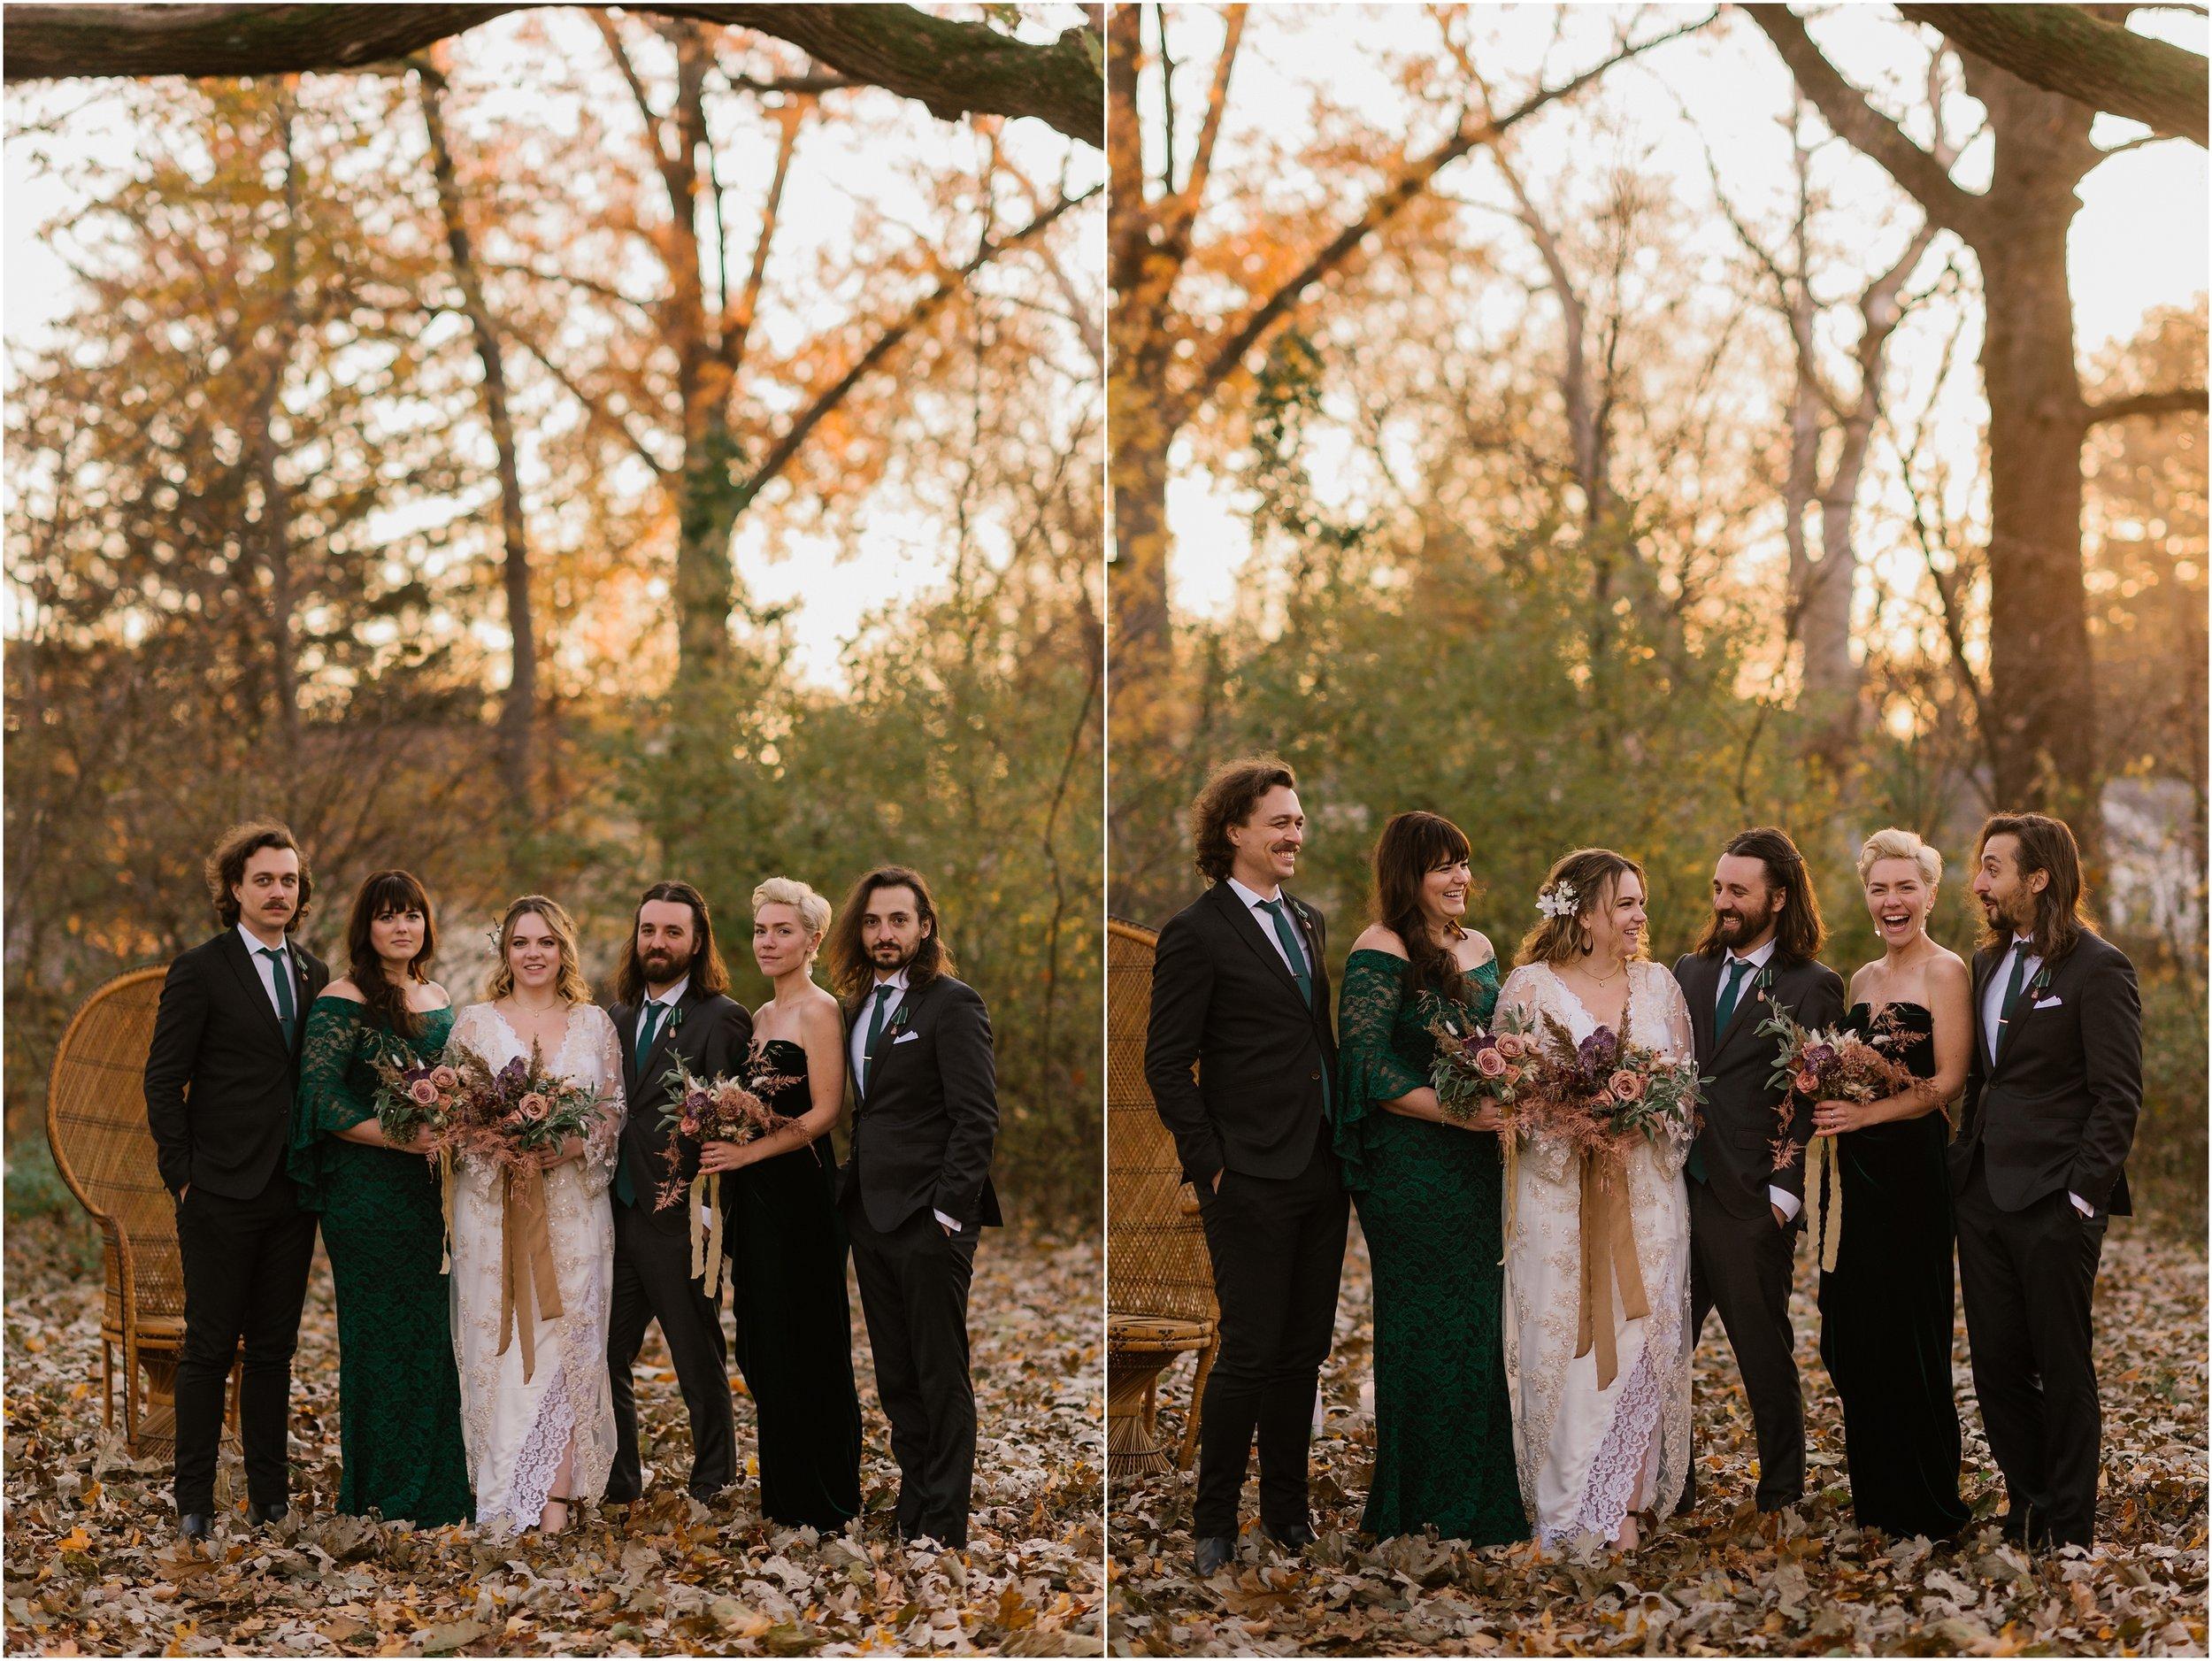 Rebecca_Shehorn_Photography_Indianapolis_Wedding_Photographer_9437.jpg